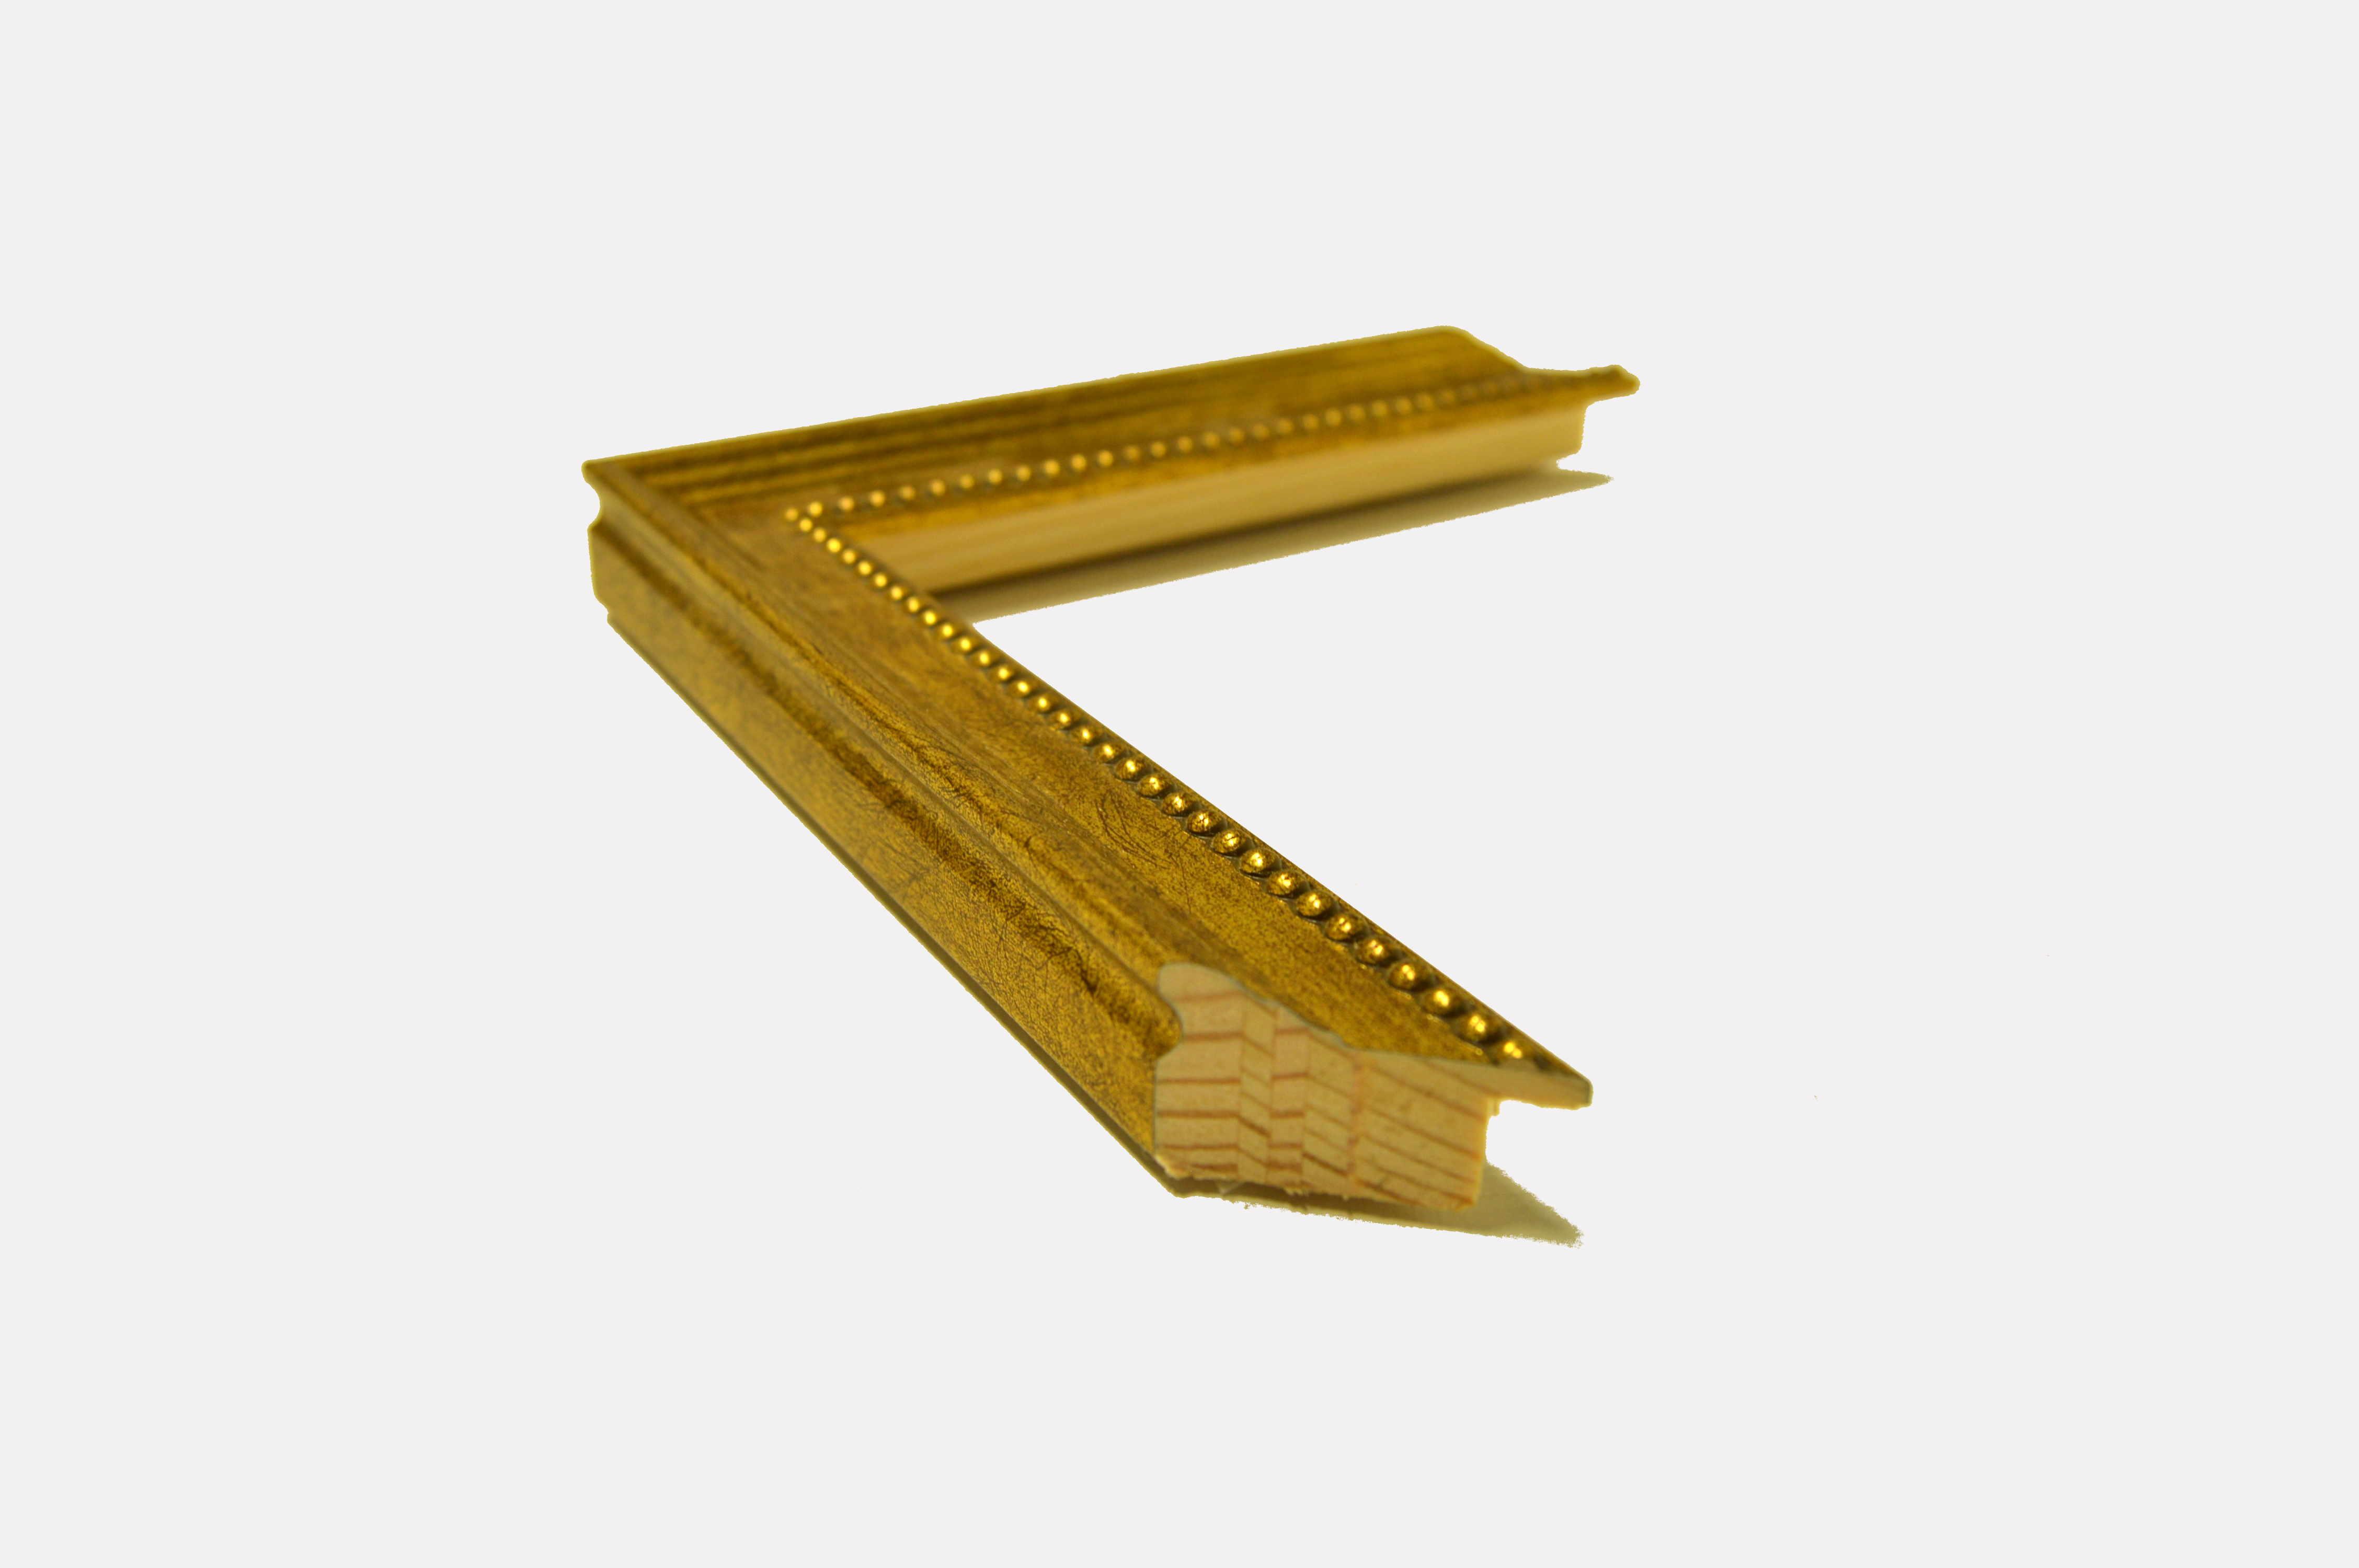 751-550-OROperfil-ancho2.7cm